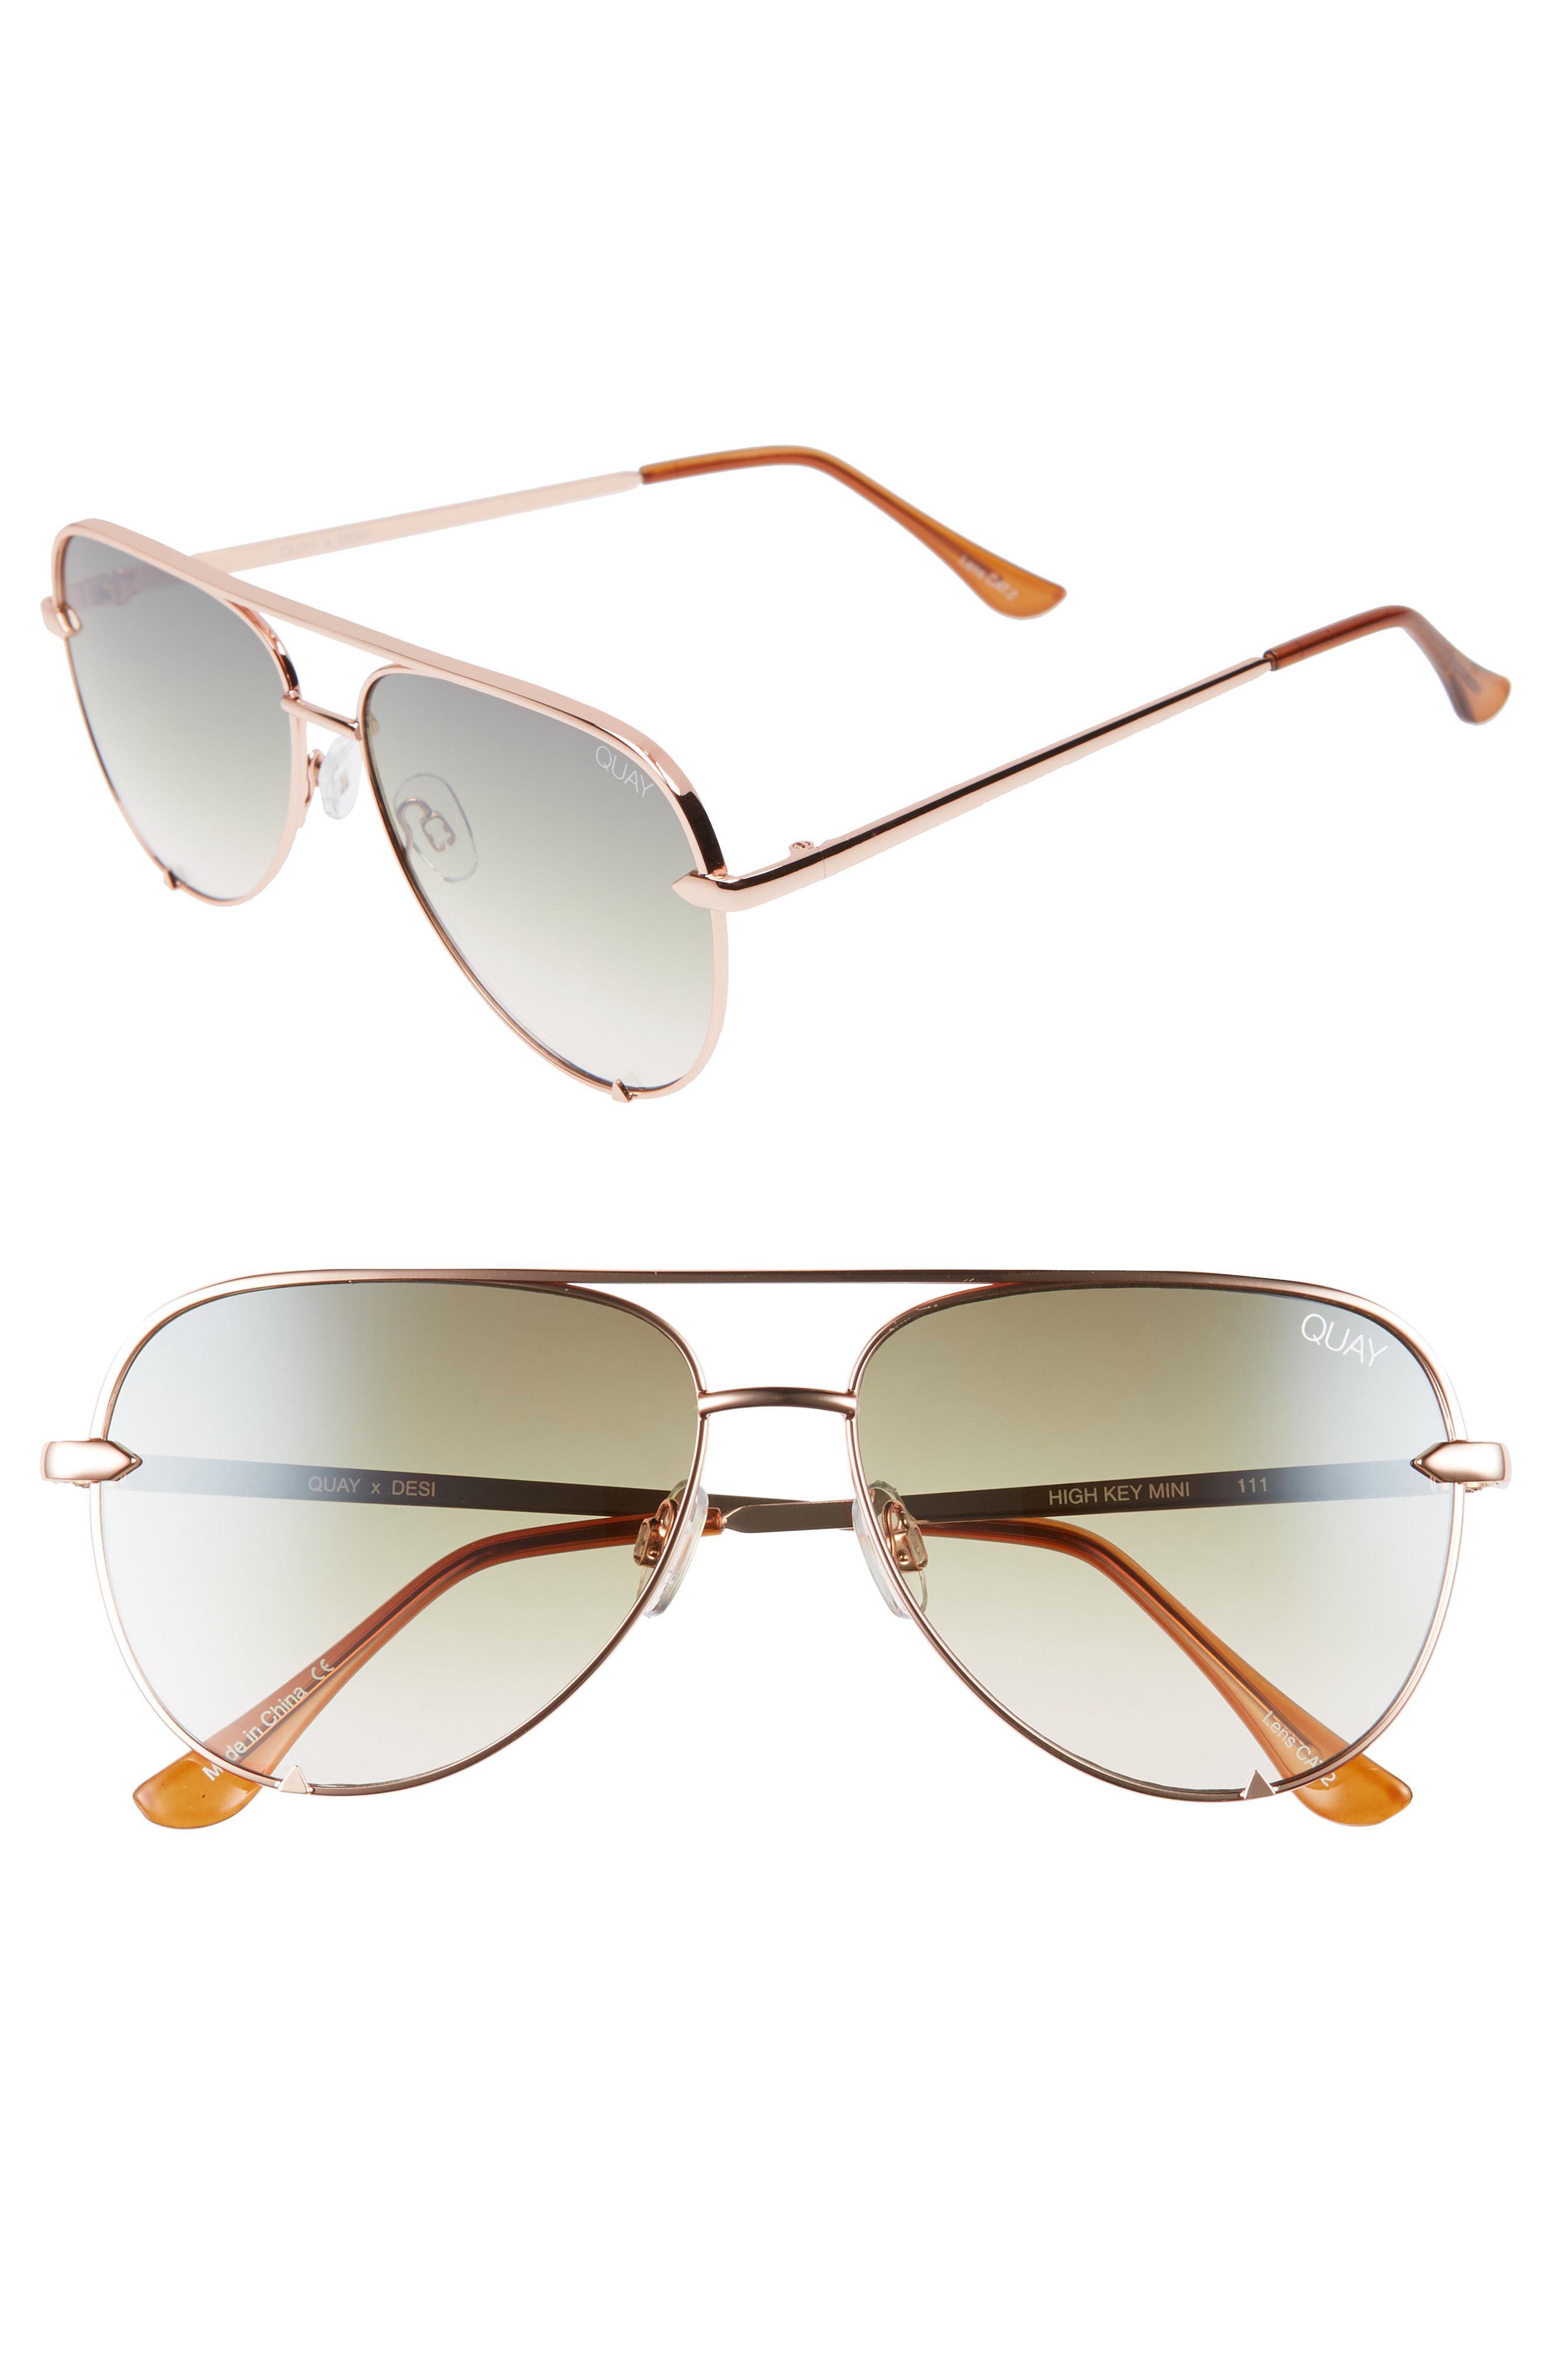 811167109c8 Desi Perkins High Key Mini 57mm Aviator Sunglasses - Lyst. View fullscreen .